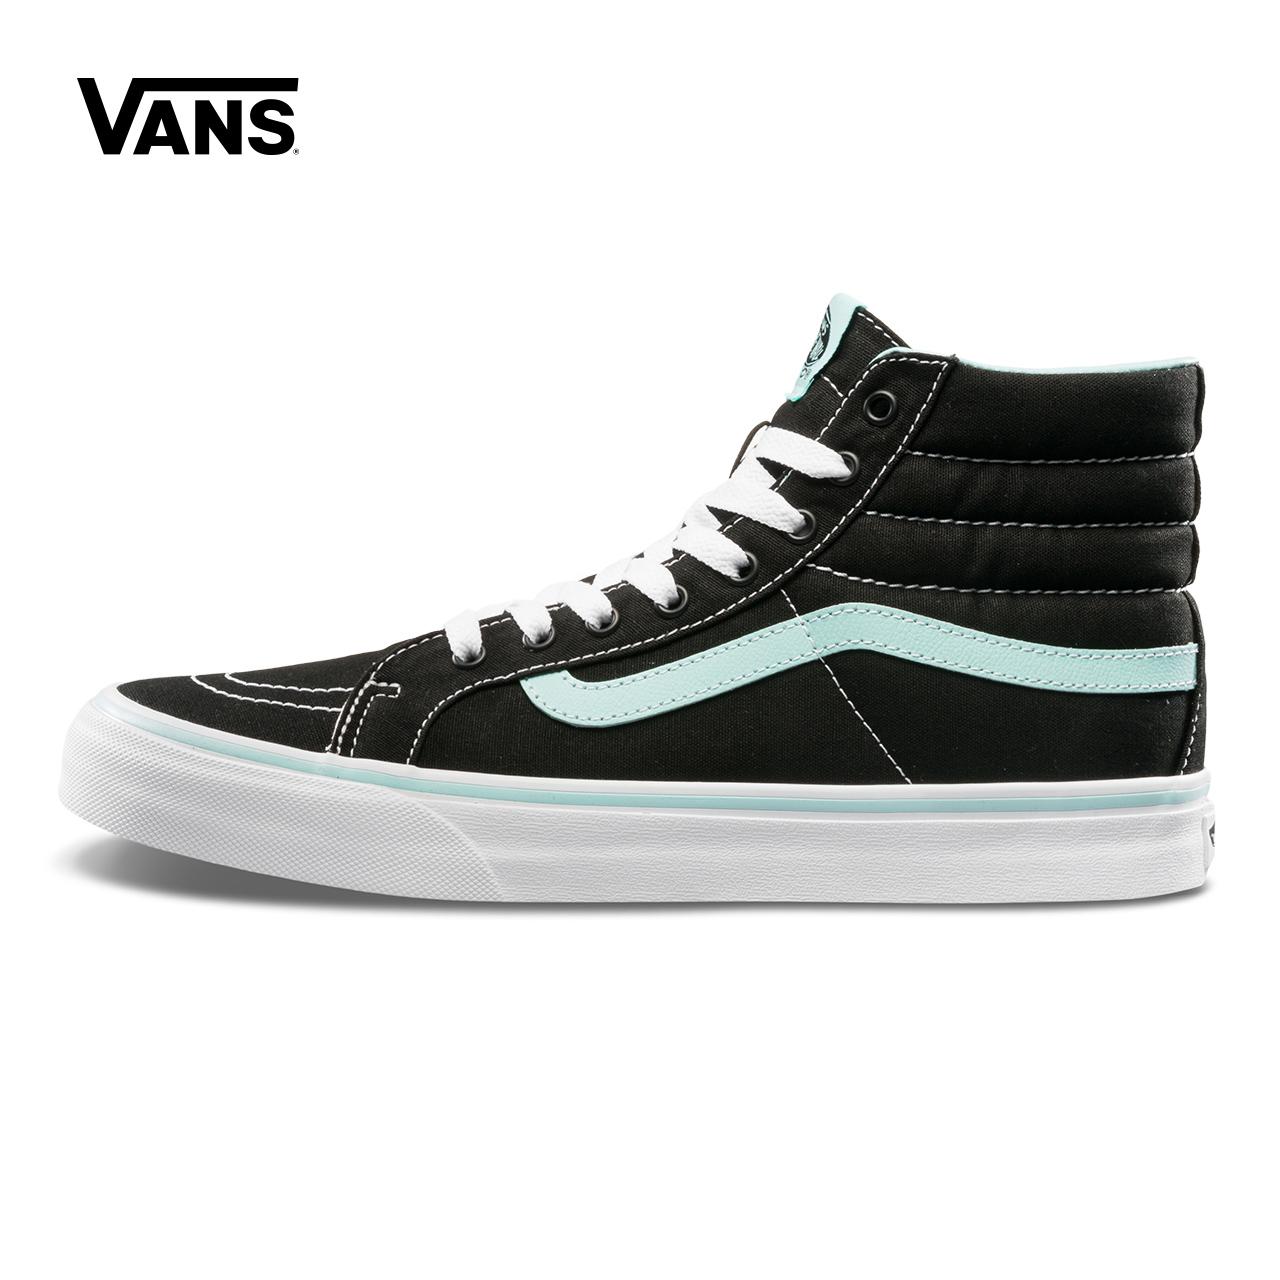 Vans范斯 经典系列 SK8-Hi帆布鞋 高帮新款女子官方正品